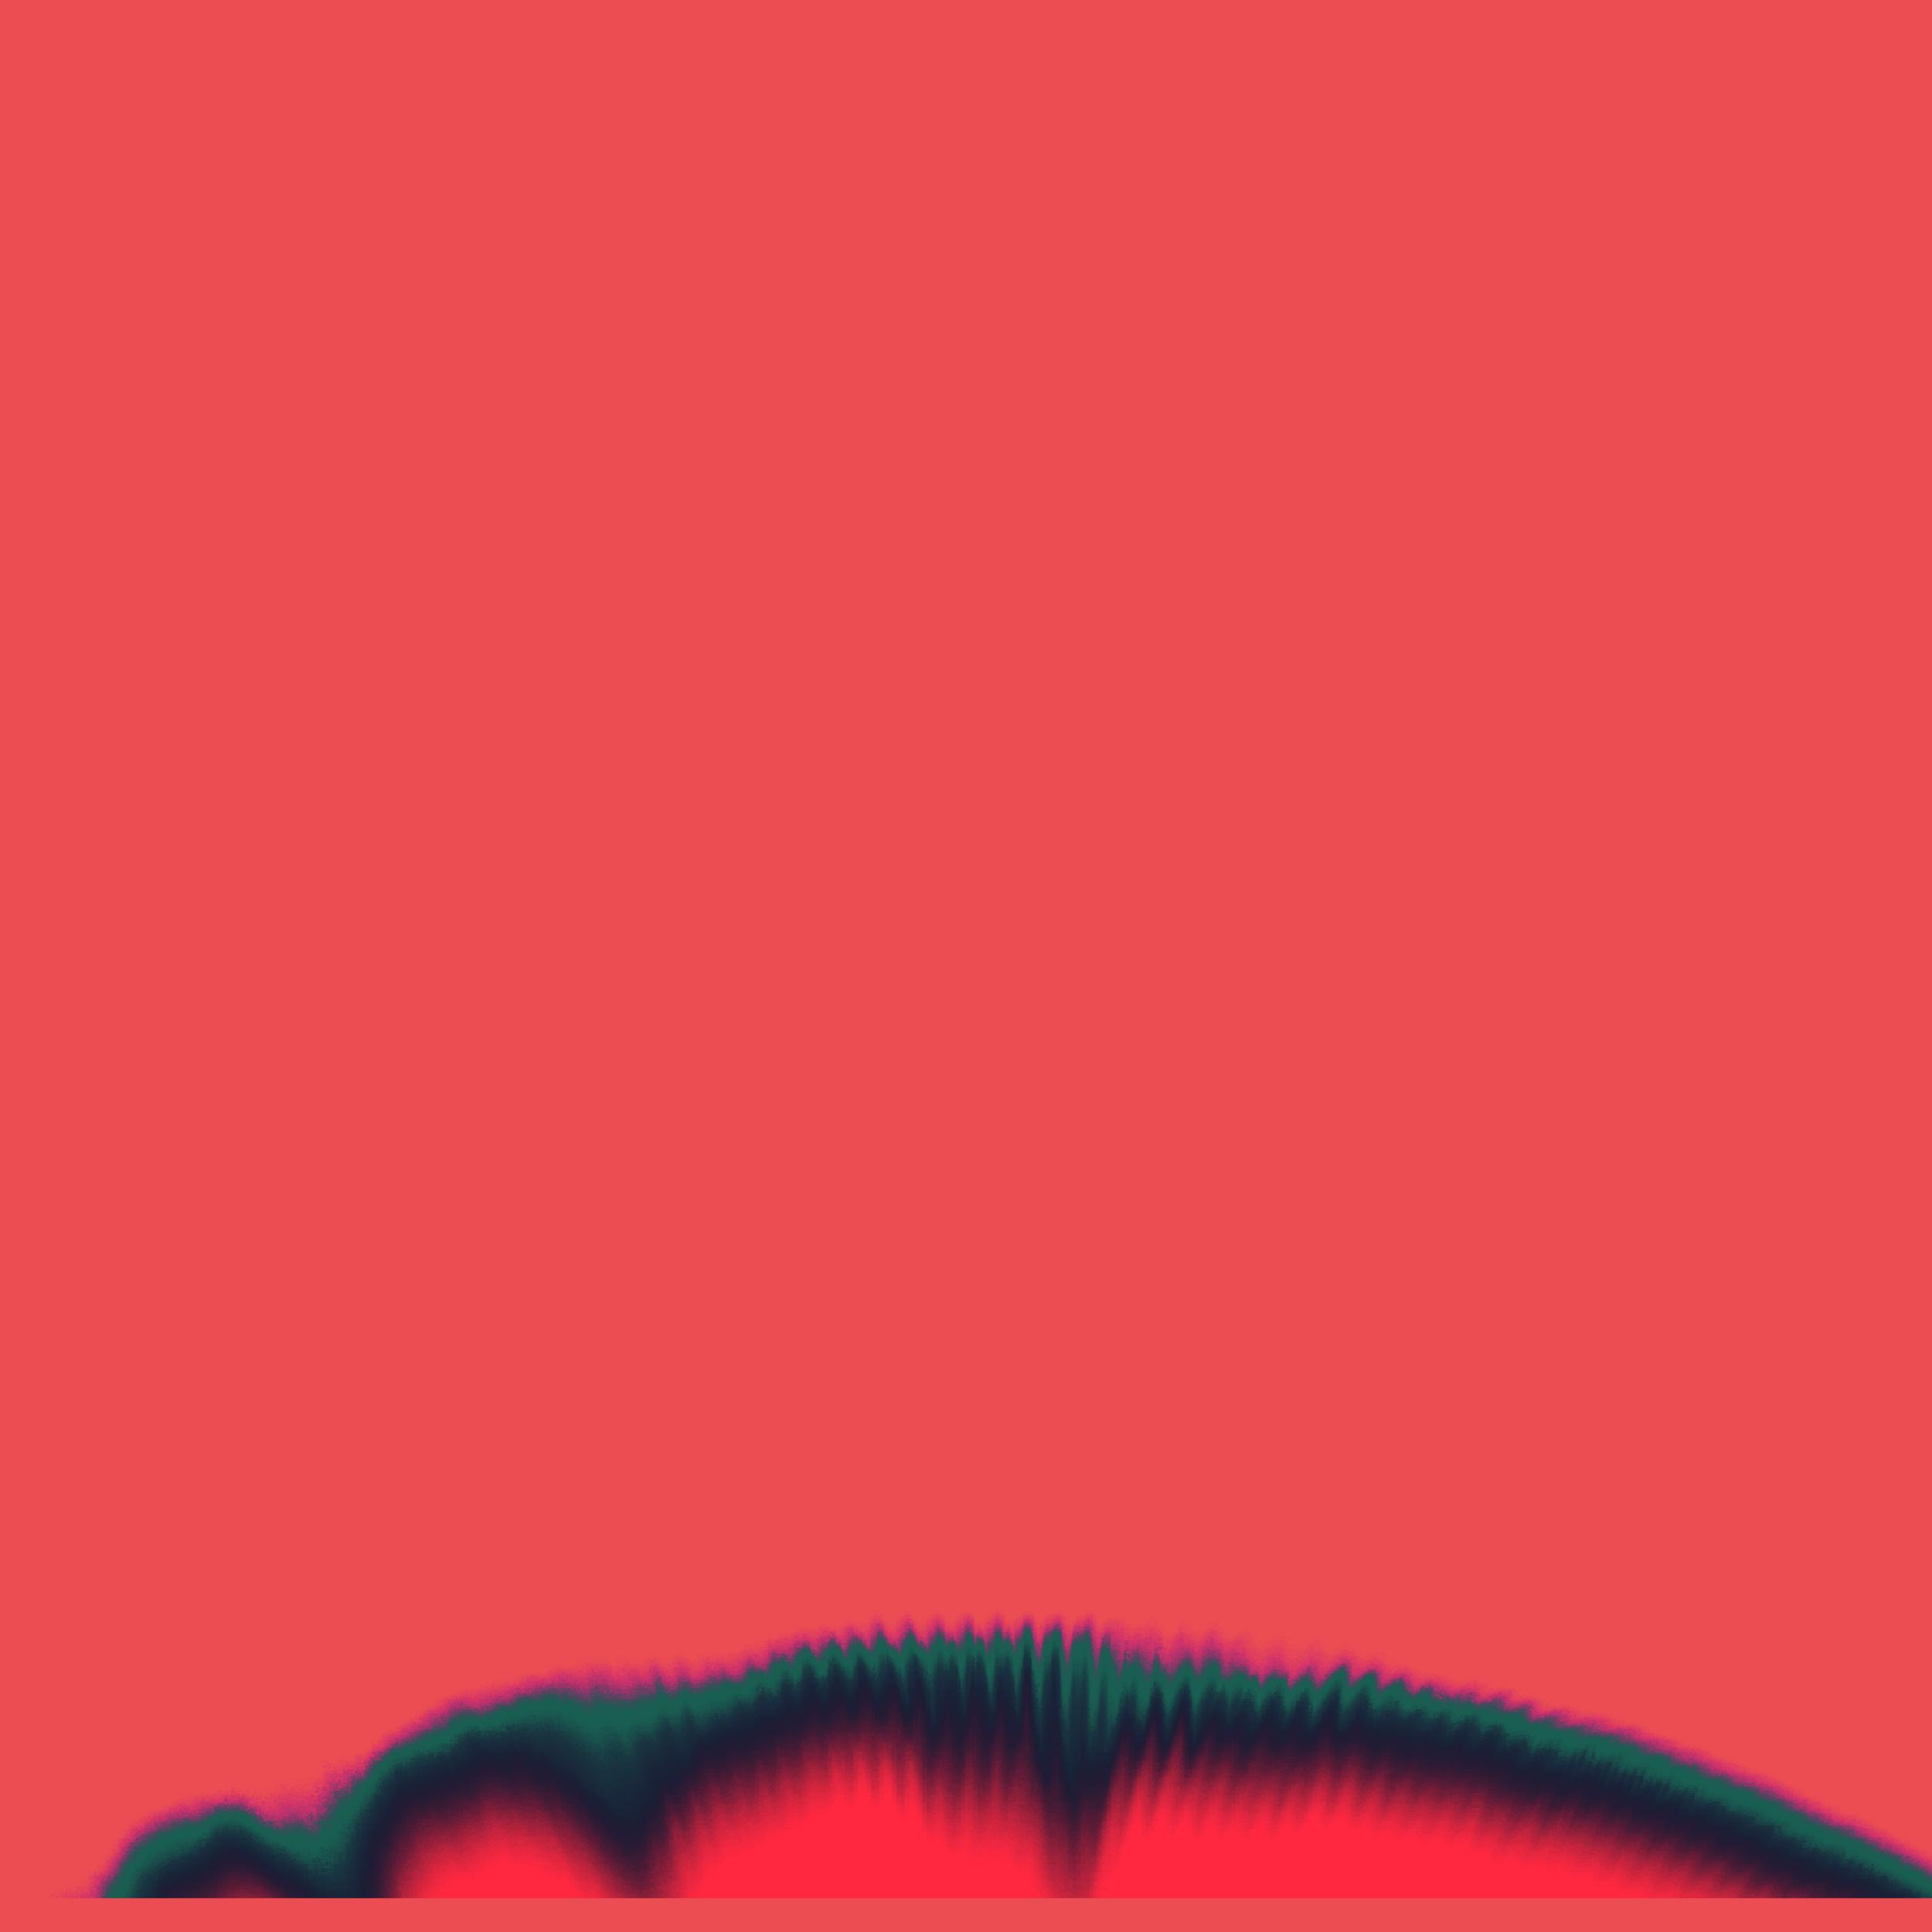 BACK_ColorField_AlbumArt.png